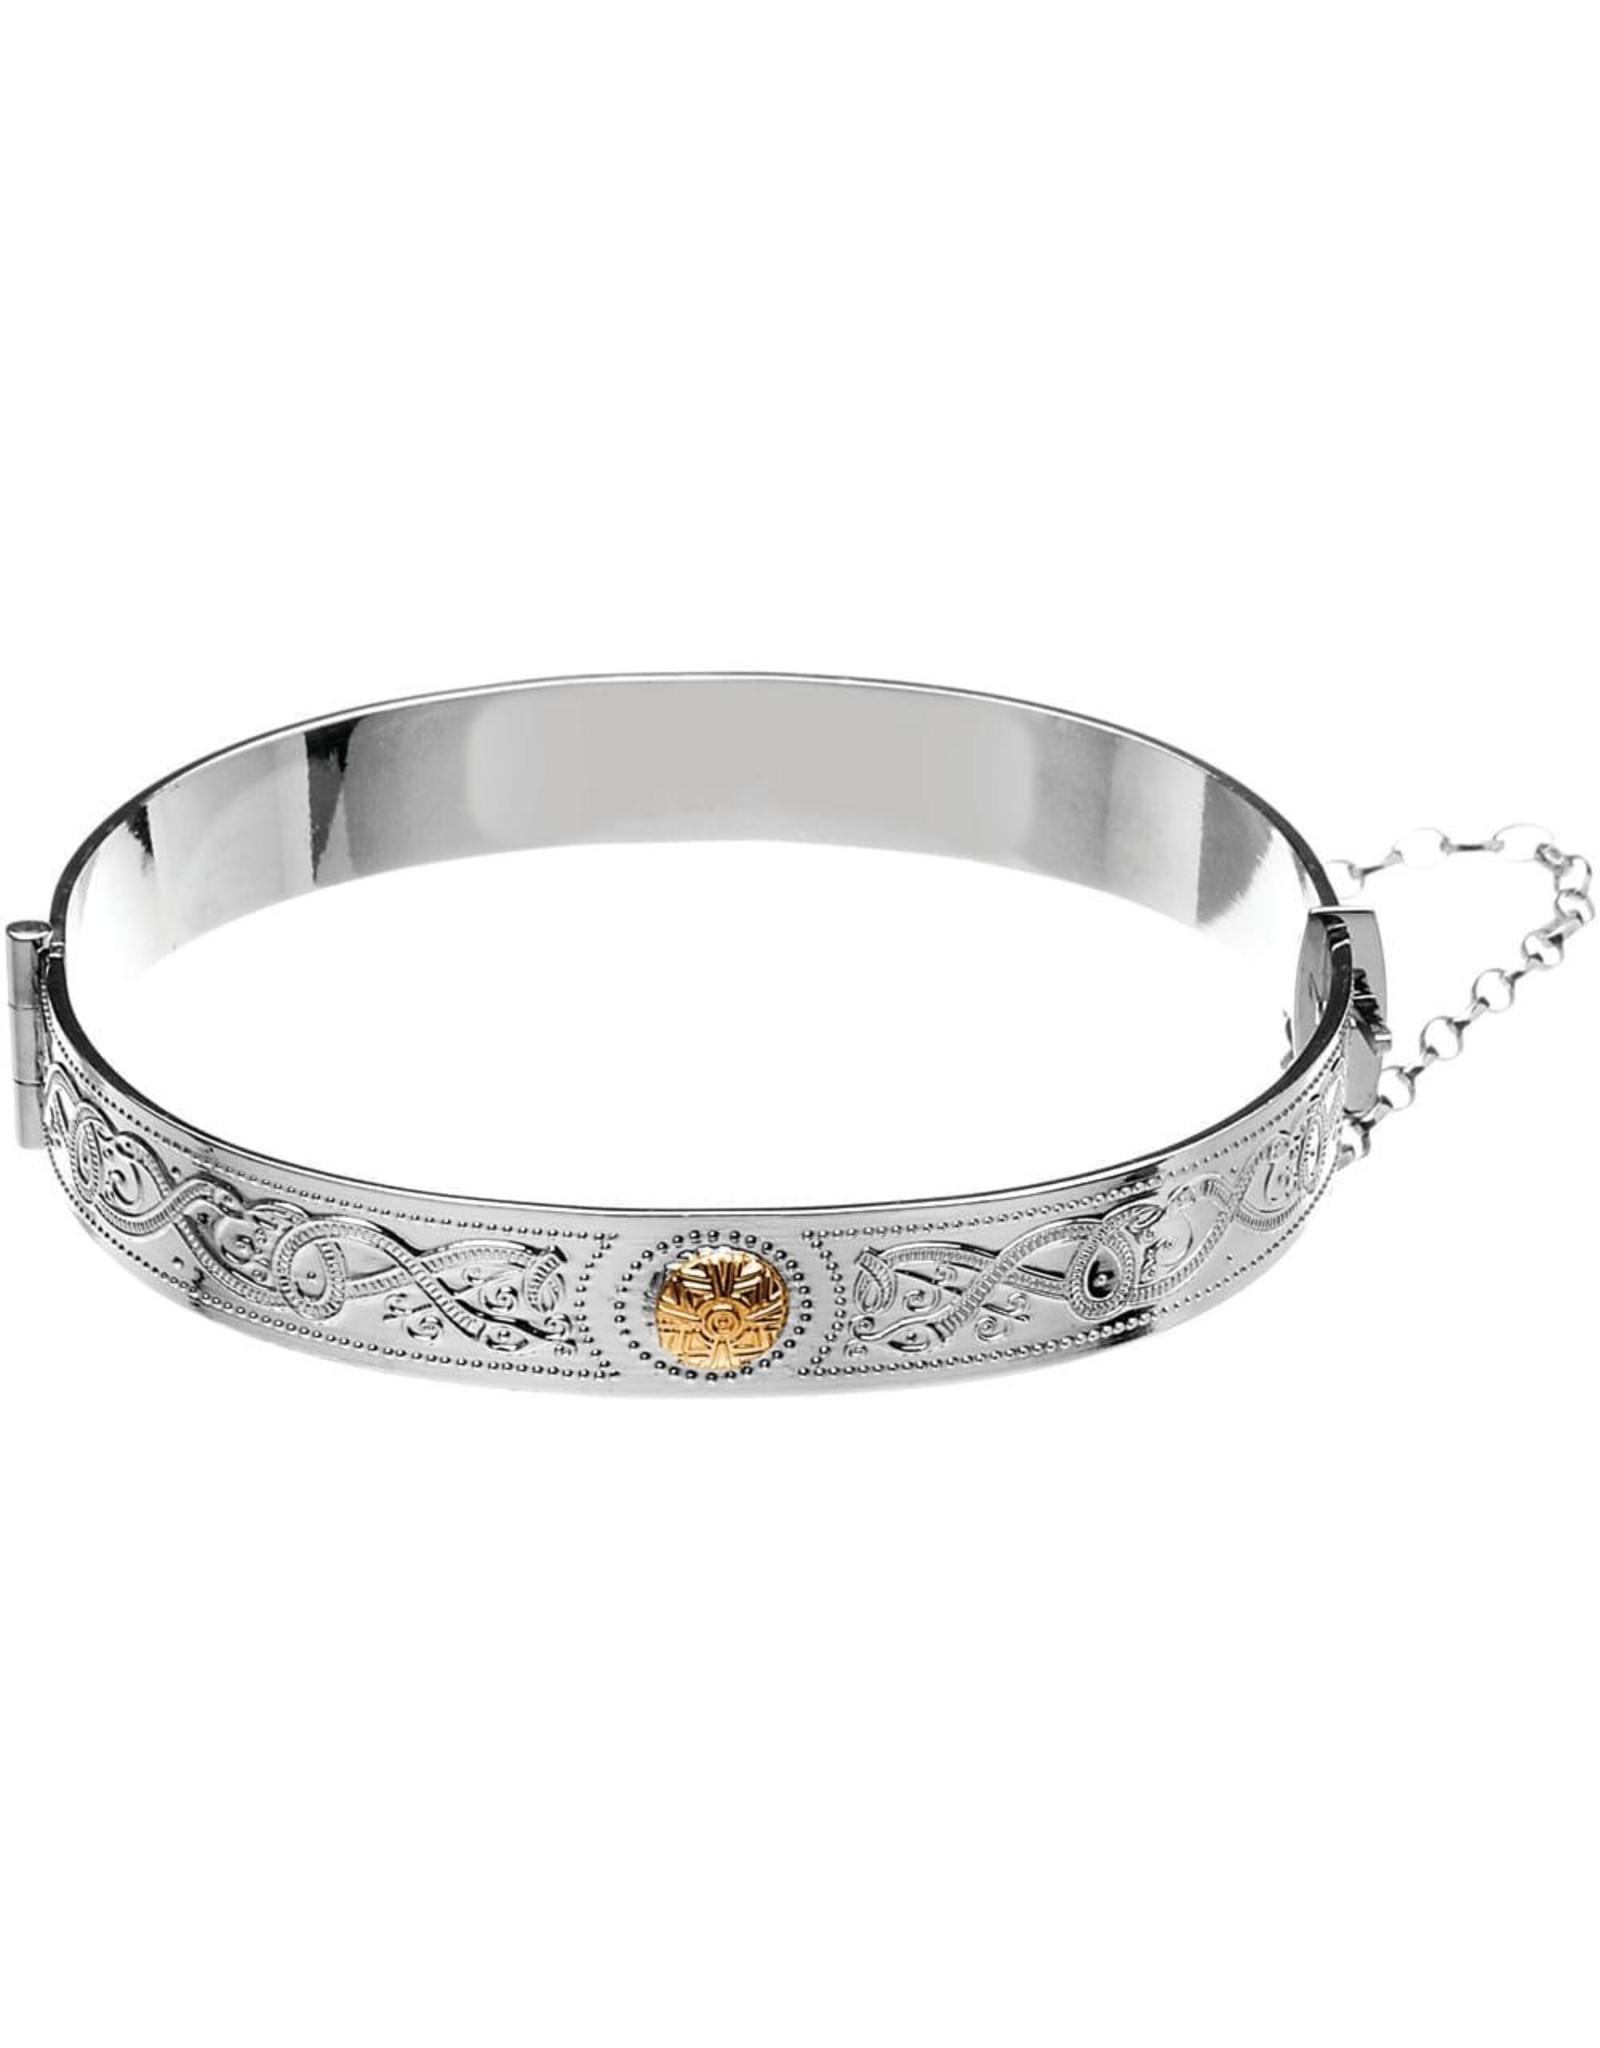 Boru Jewelry Celtic Warrior Original Bangle with 18k Gold Bead